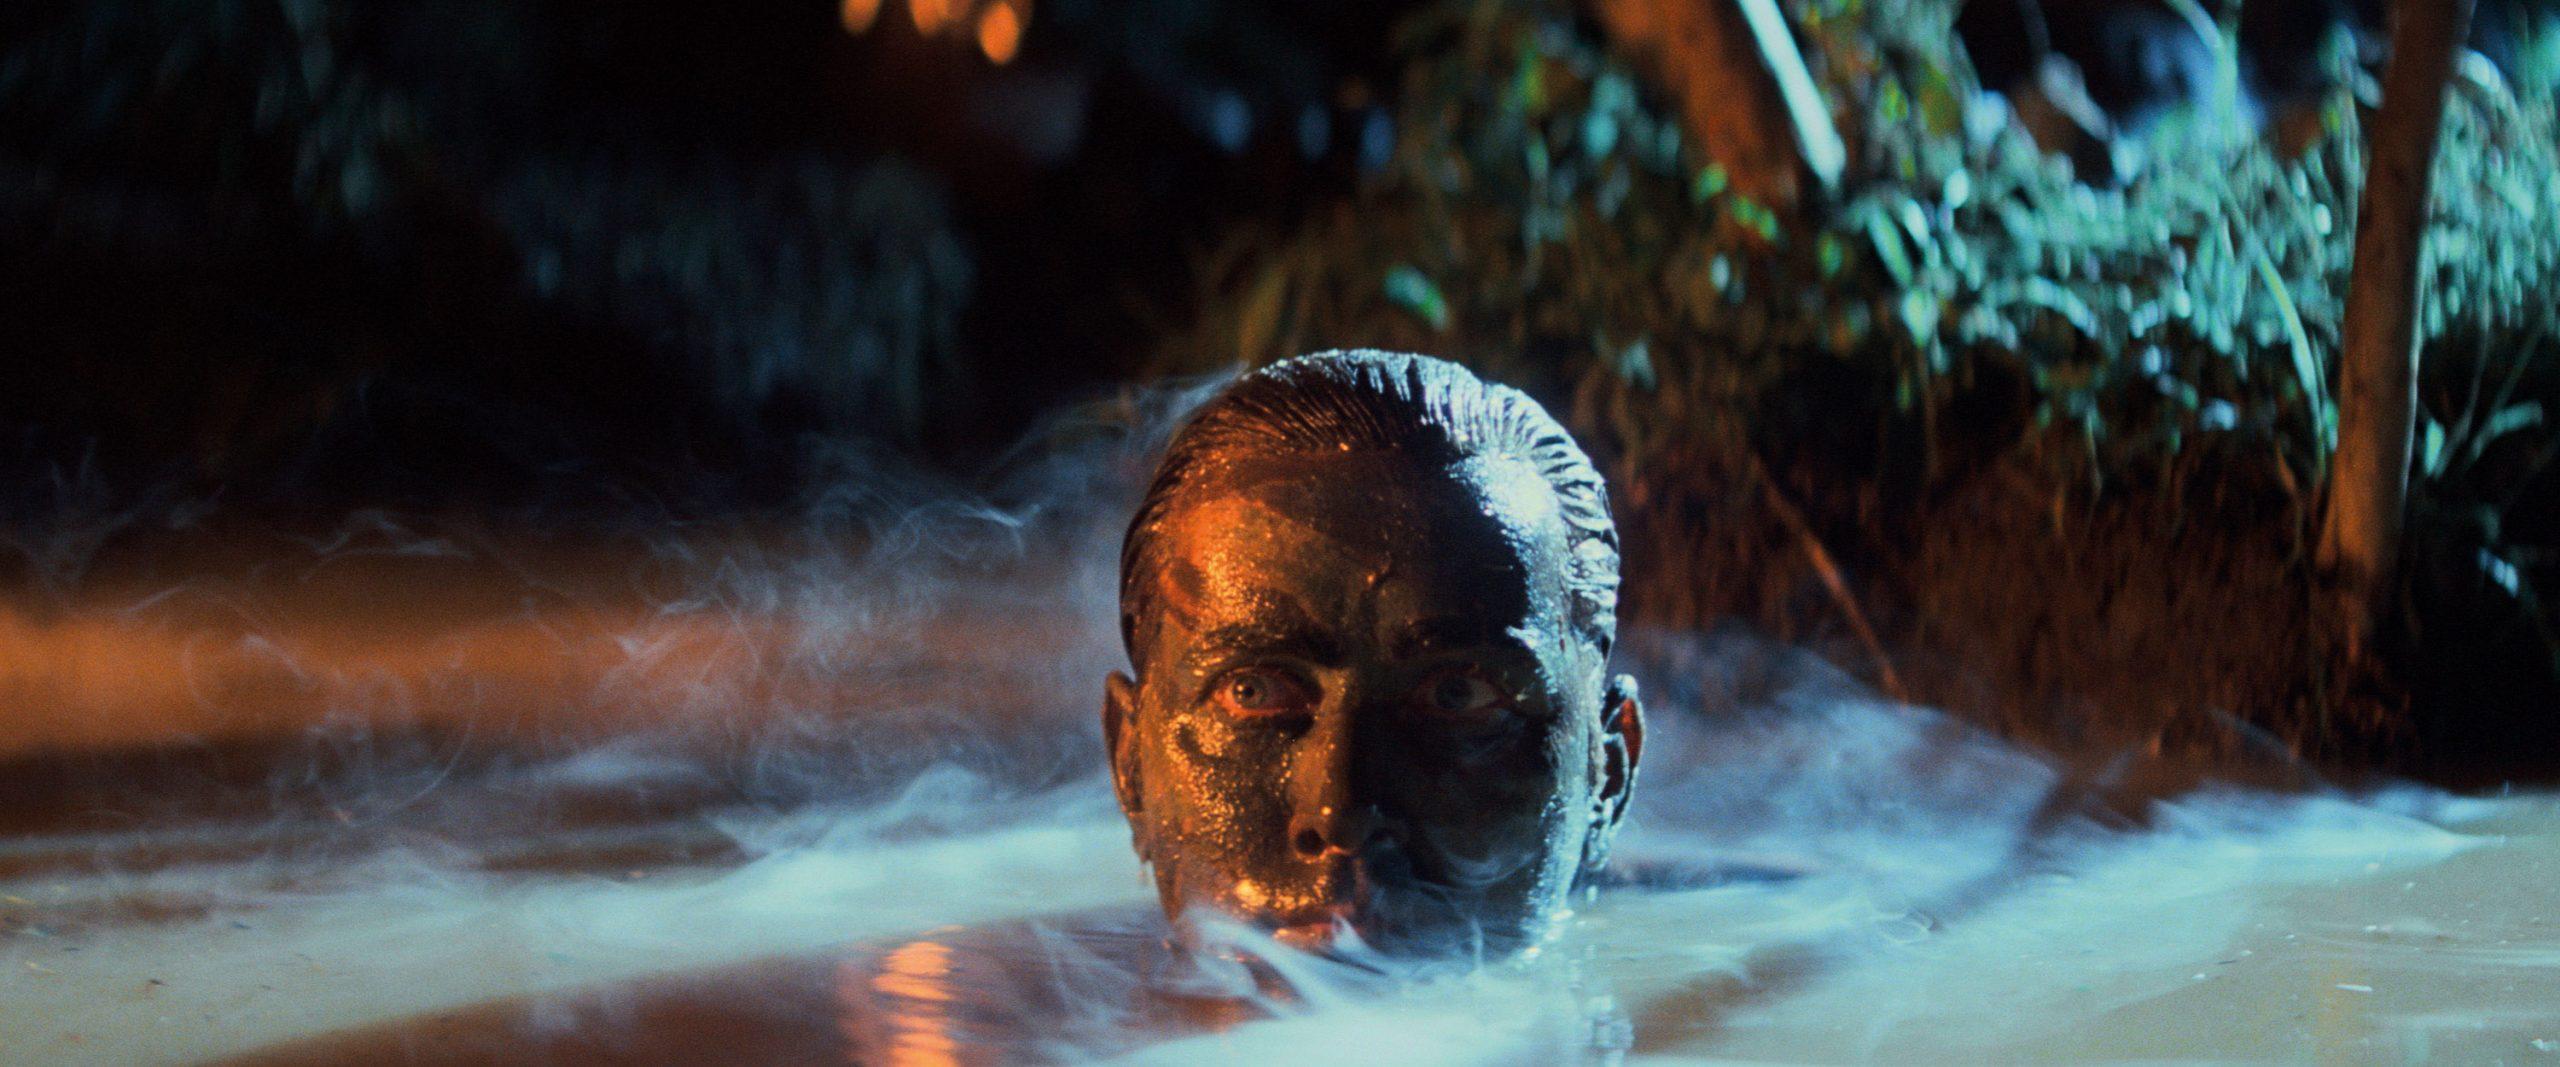 Filmtipps Apocalypse Now